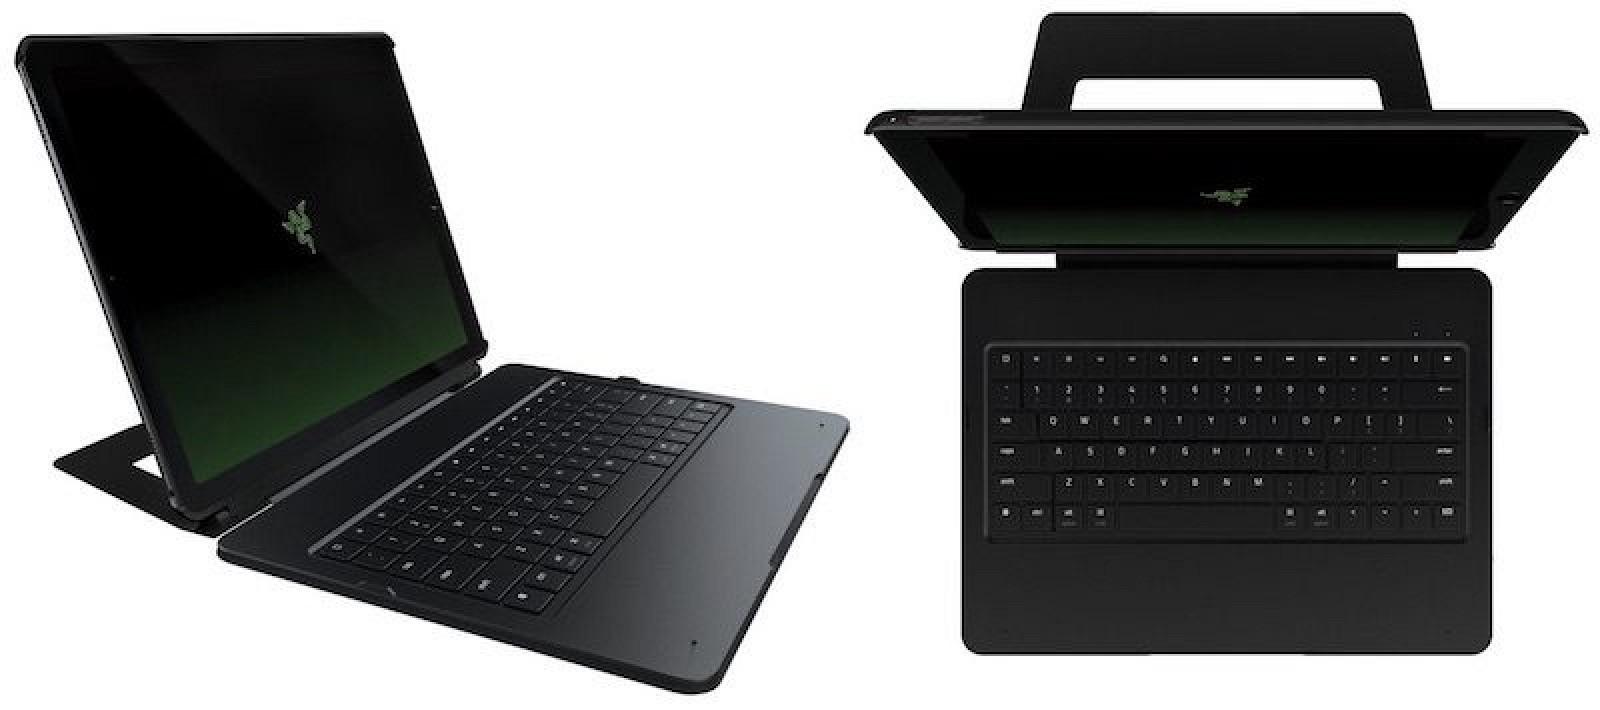 Razer Debuts $170 'Mechanical Keyboard Case' for 12.9-inch ...